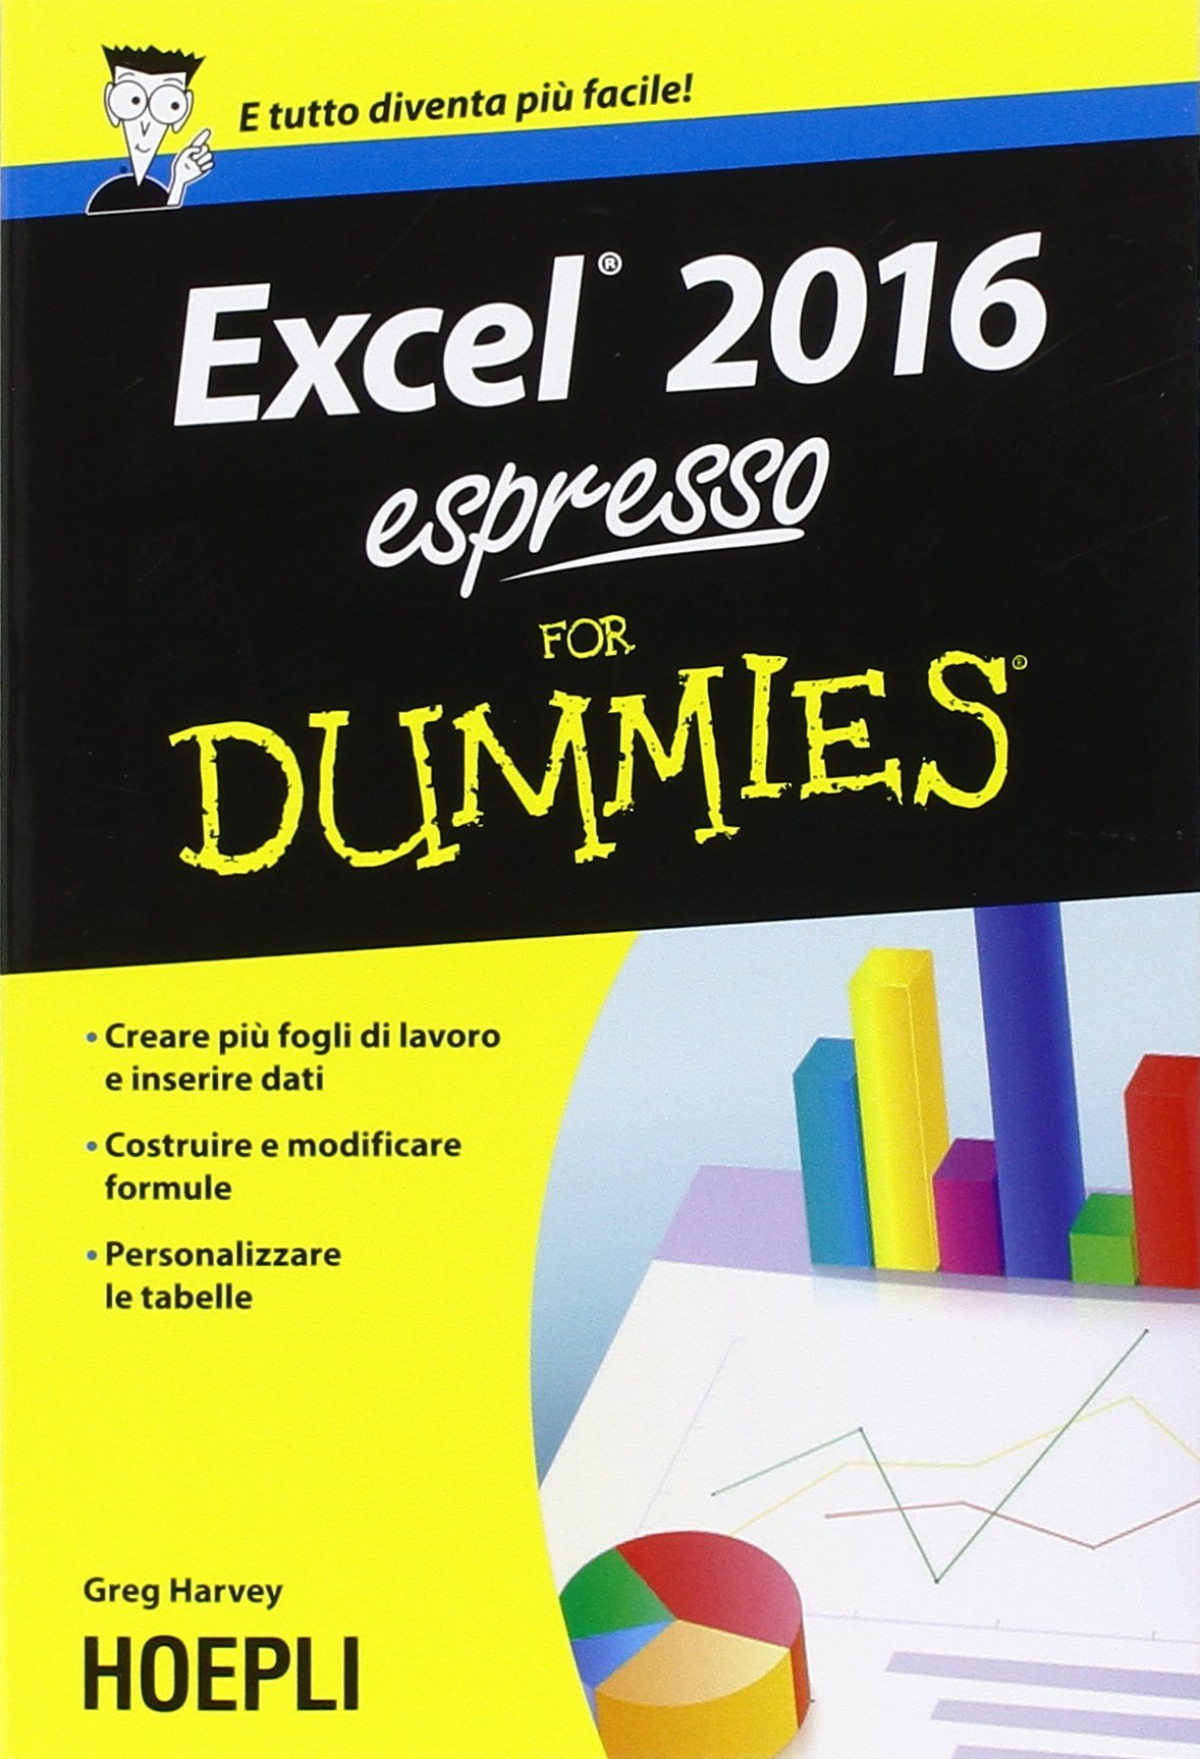 Excel 2016 espresso For Dummies 9788820371814